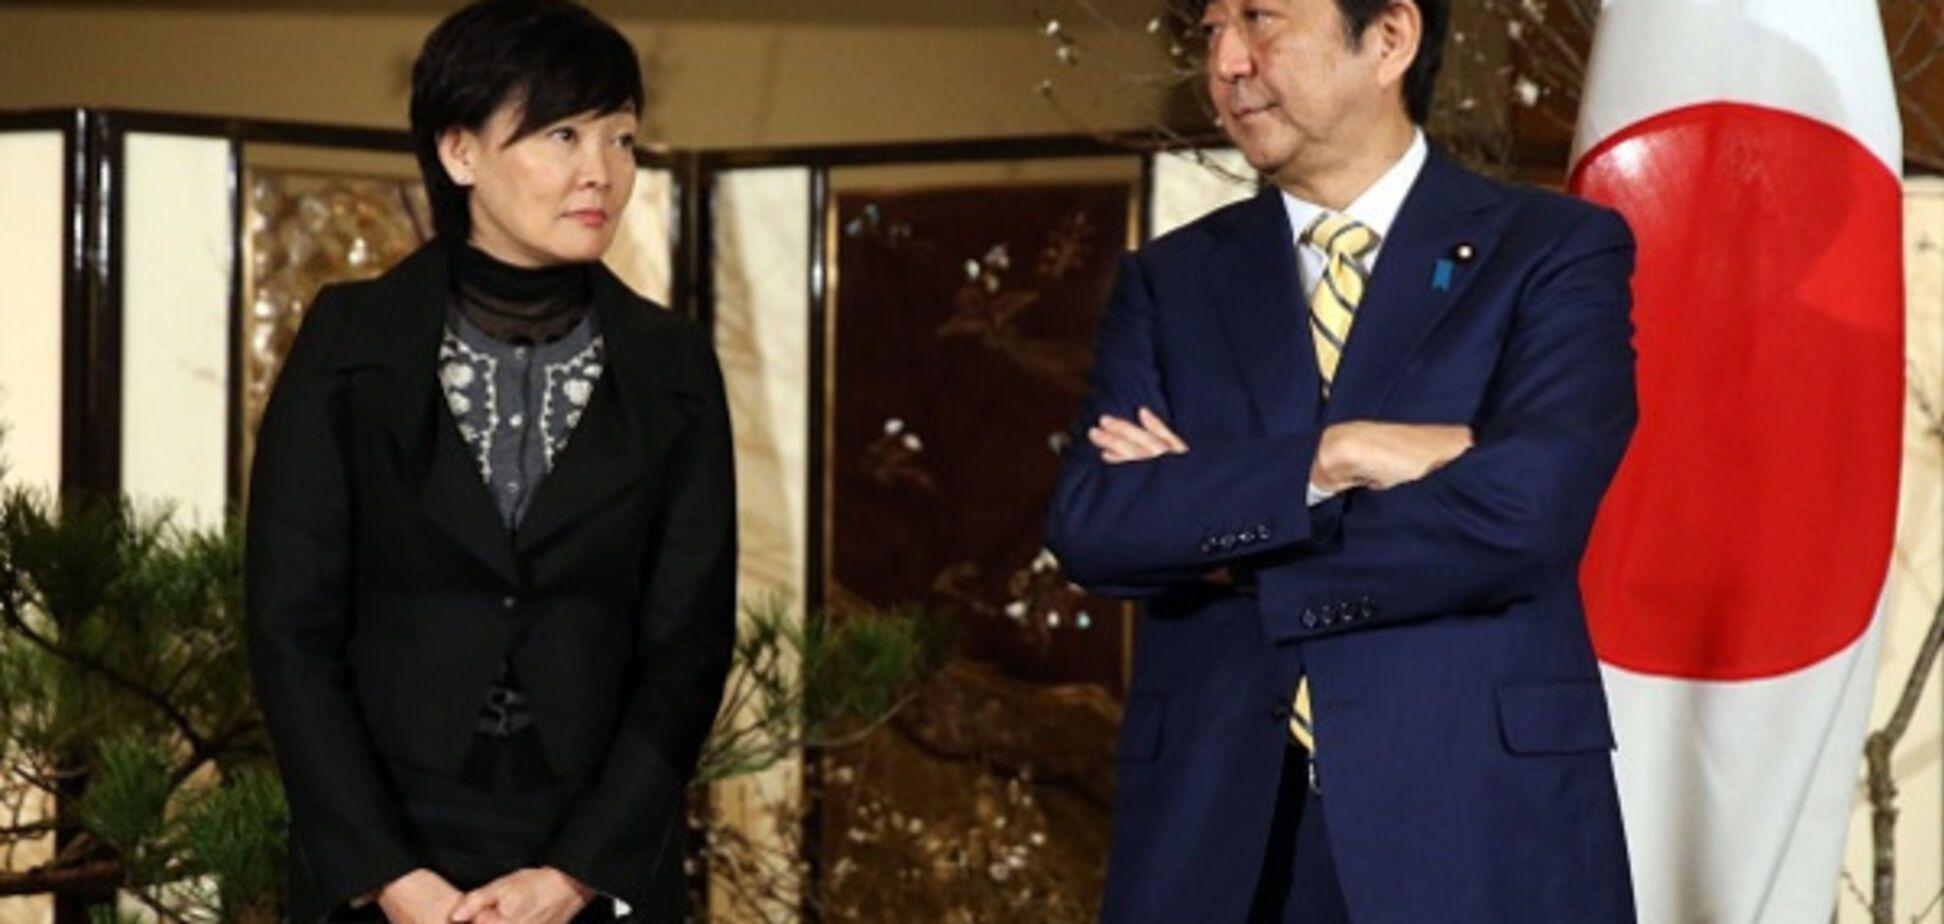 Синдзо Абэ ждет Владимира Путина